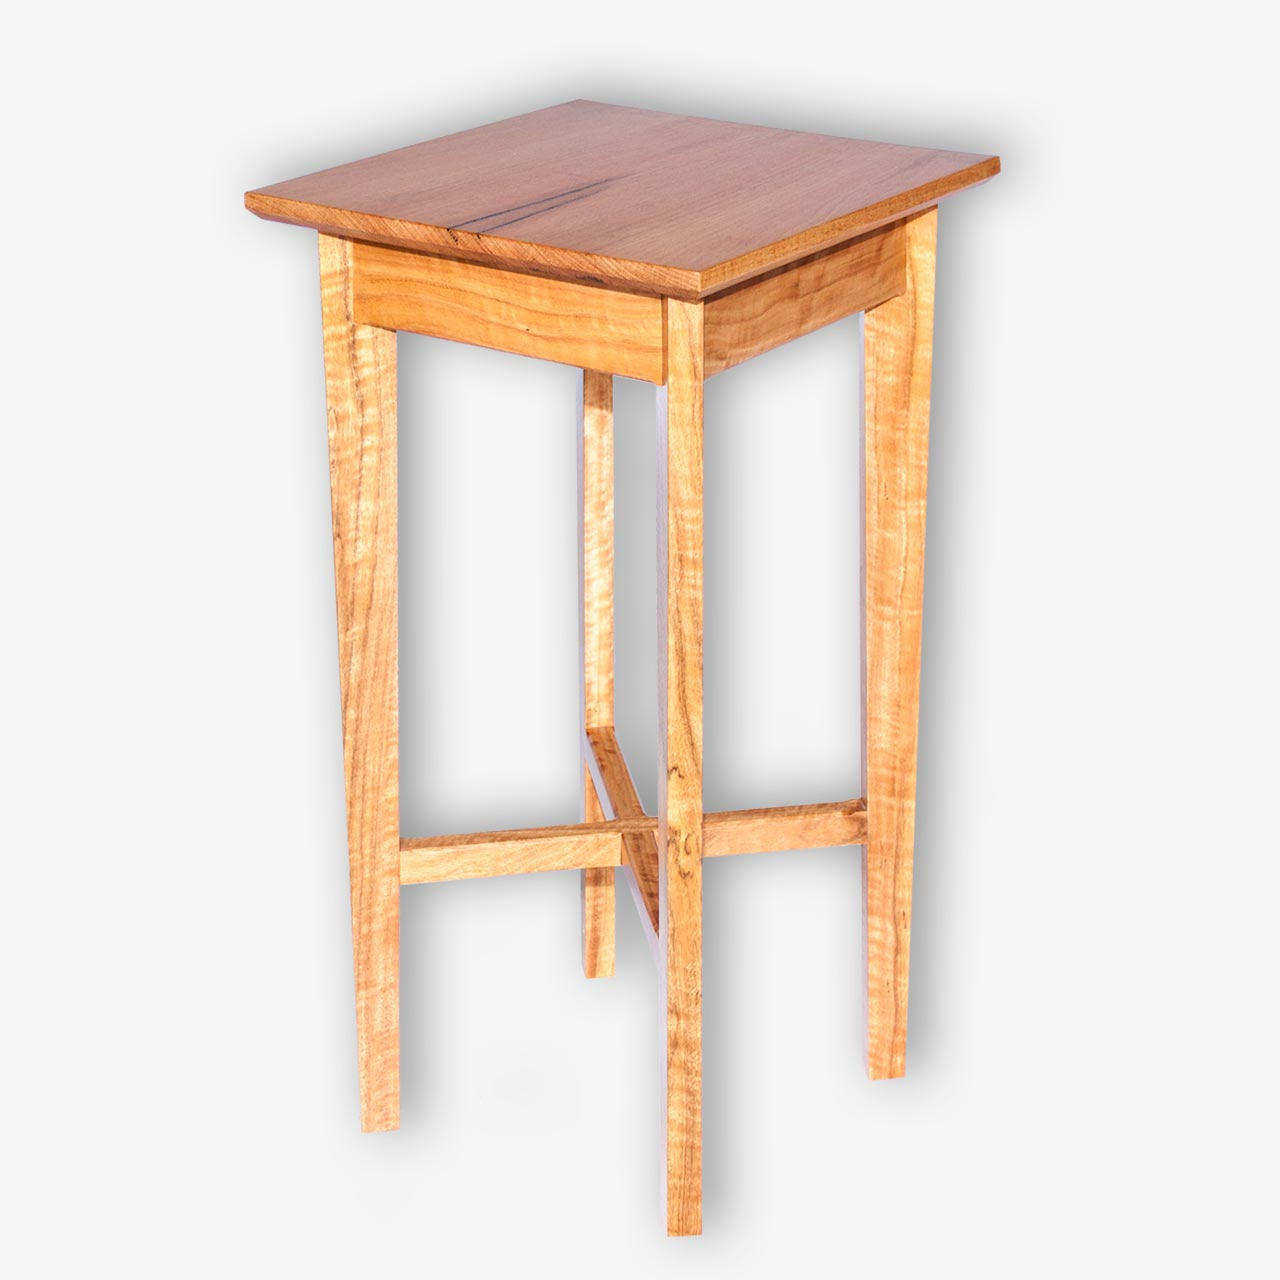 Classic lamp table treeton fine wood studio classic lamp table marri cowaramup busselton margaret river aloadofball Images